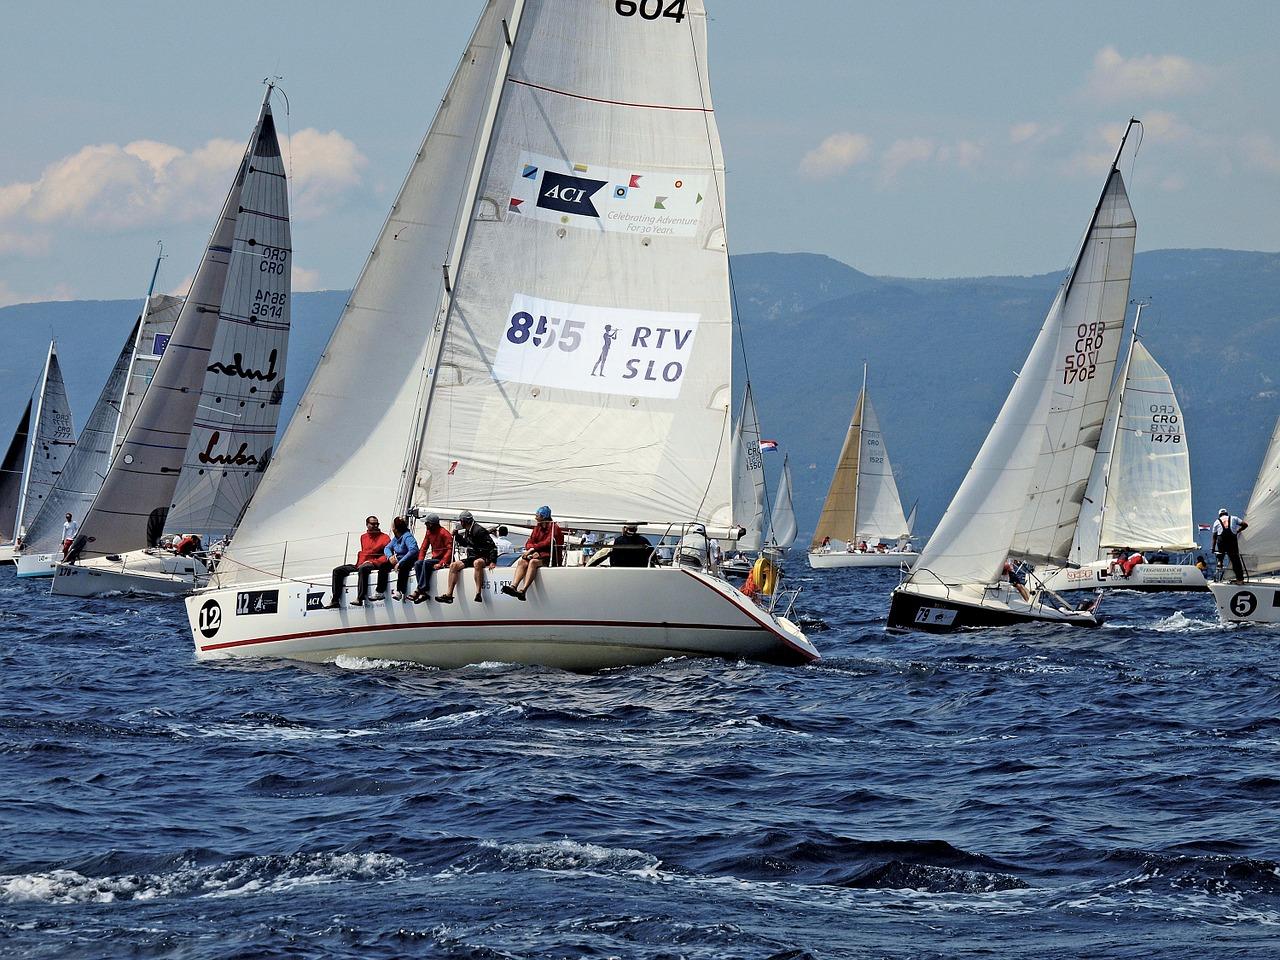 Sport Events COSTA SMERALDA